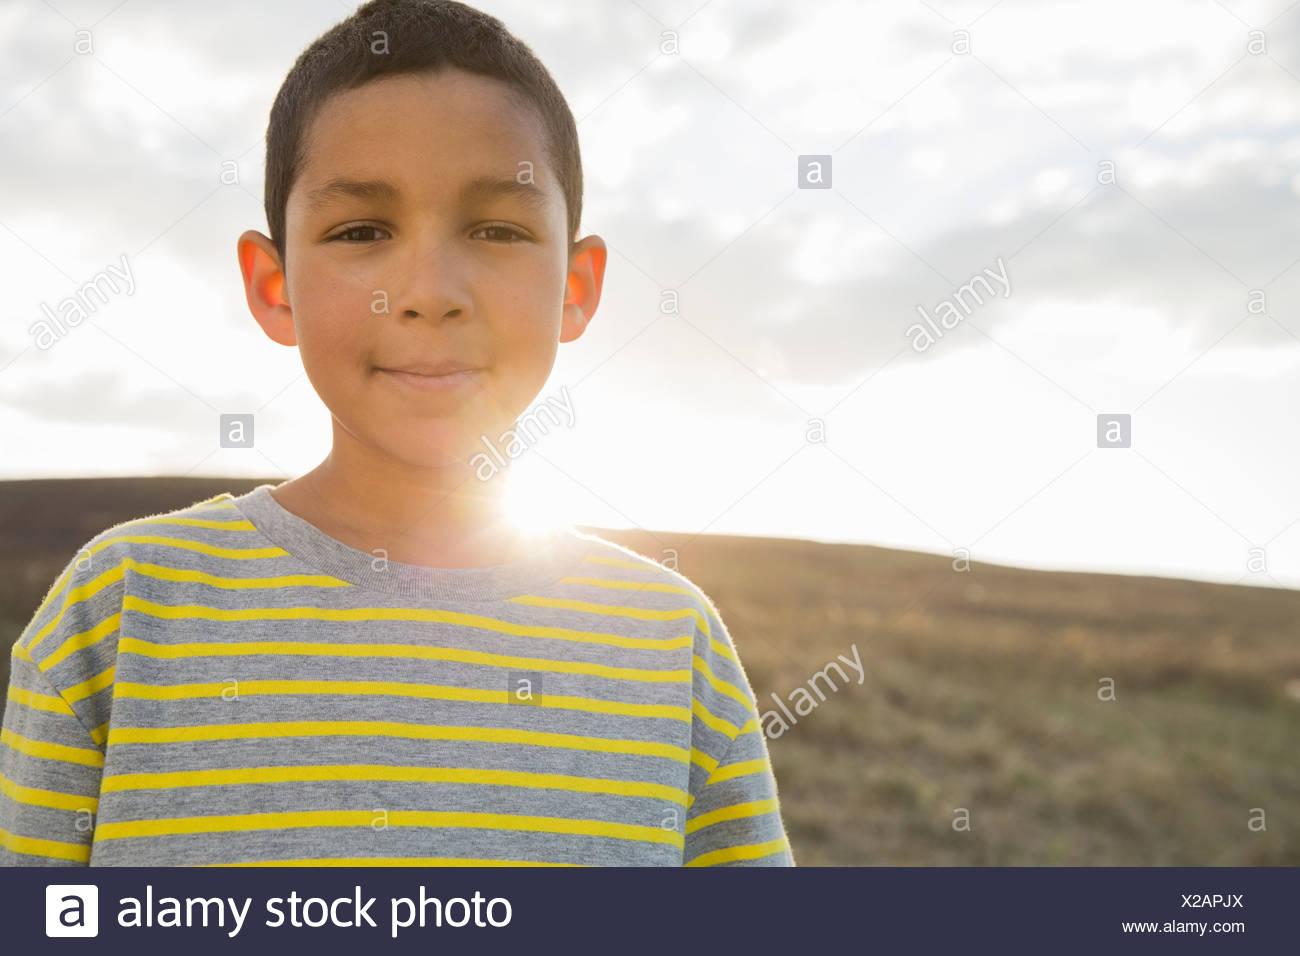 Portrait of schoolboy smiling - Stock Image